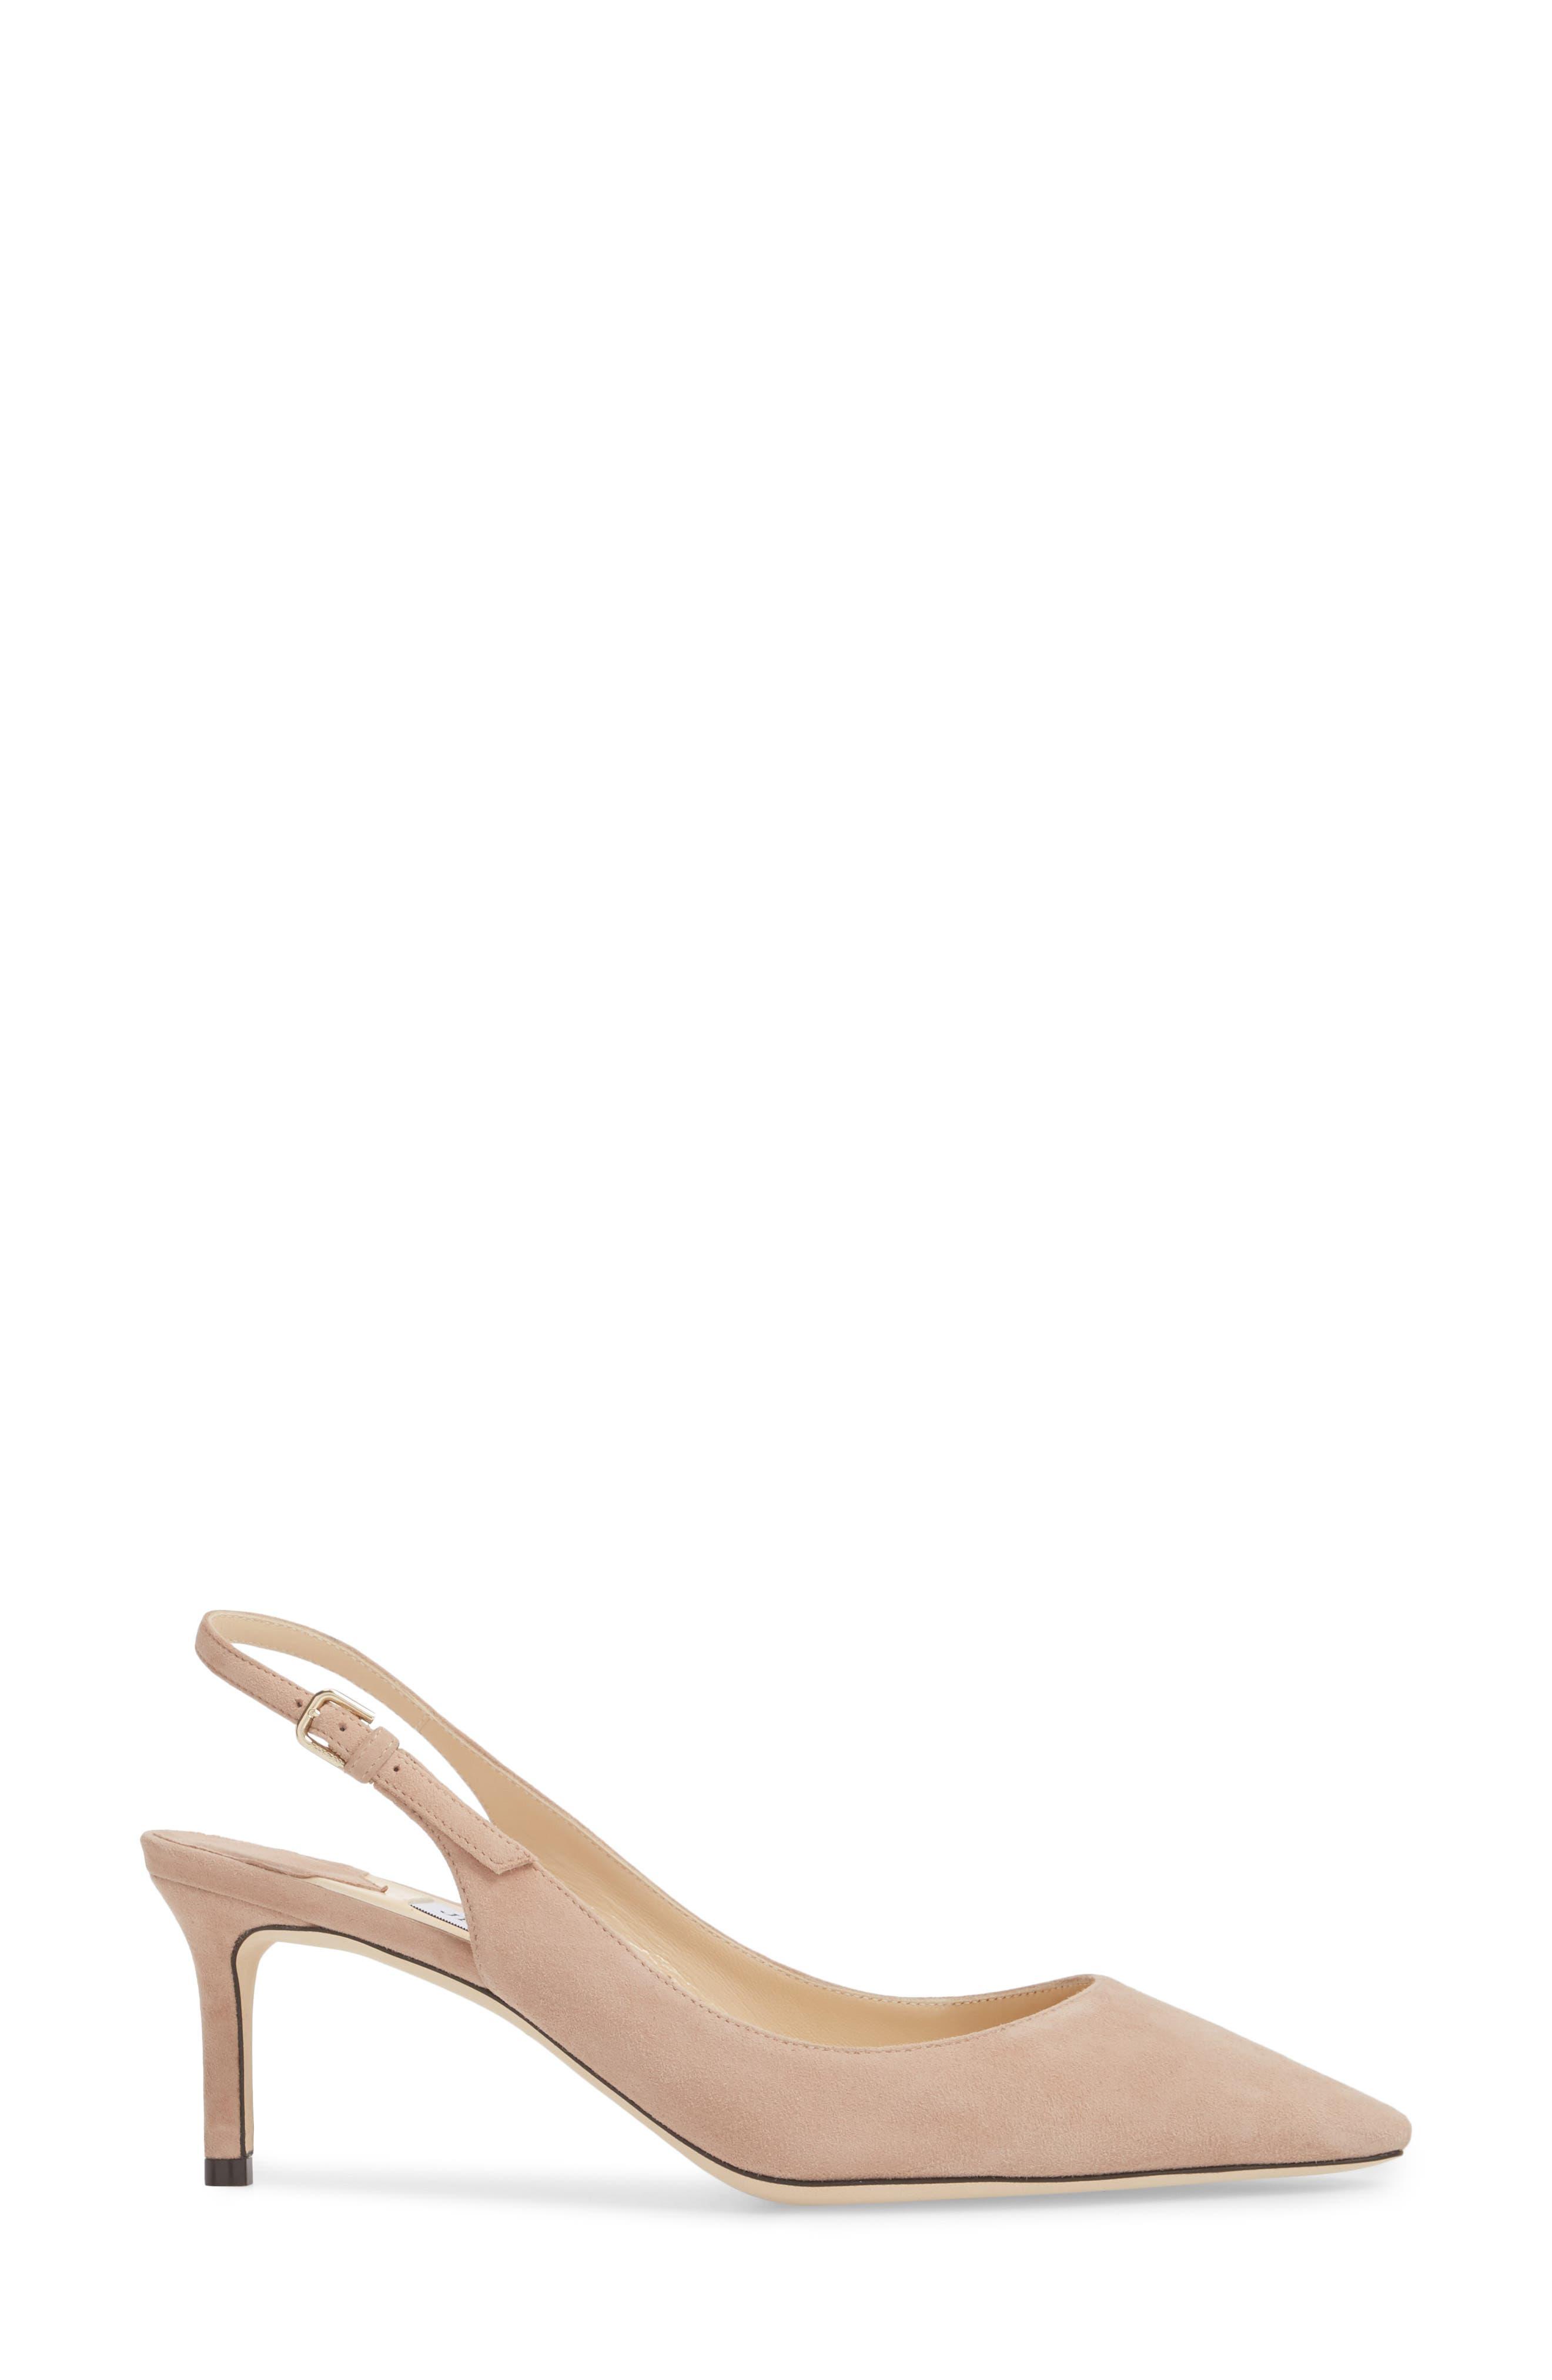 Erin Pointy Toe Slingback Pump,                             Alternate thumbnail 3, color,                             Ballet Pink